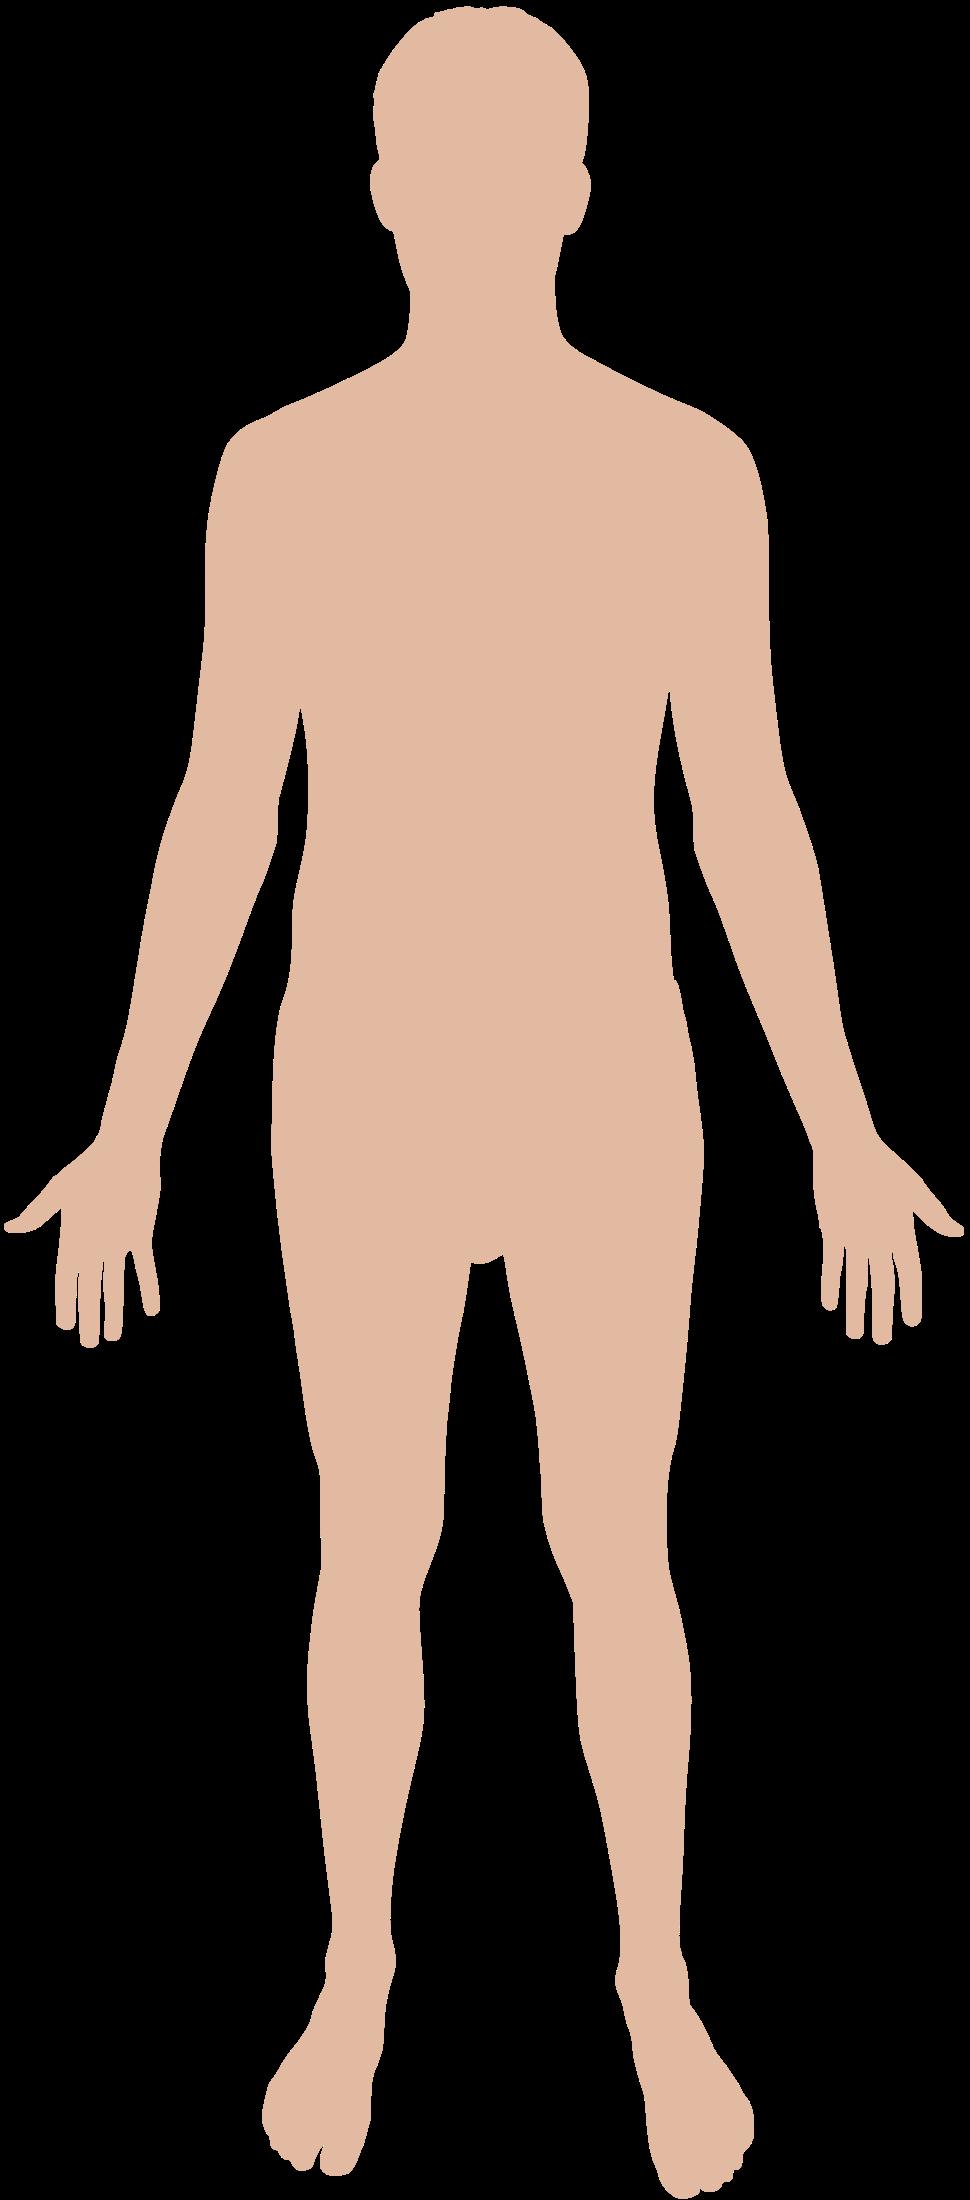 Png hd transparent images. Human clipart human figure